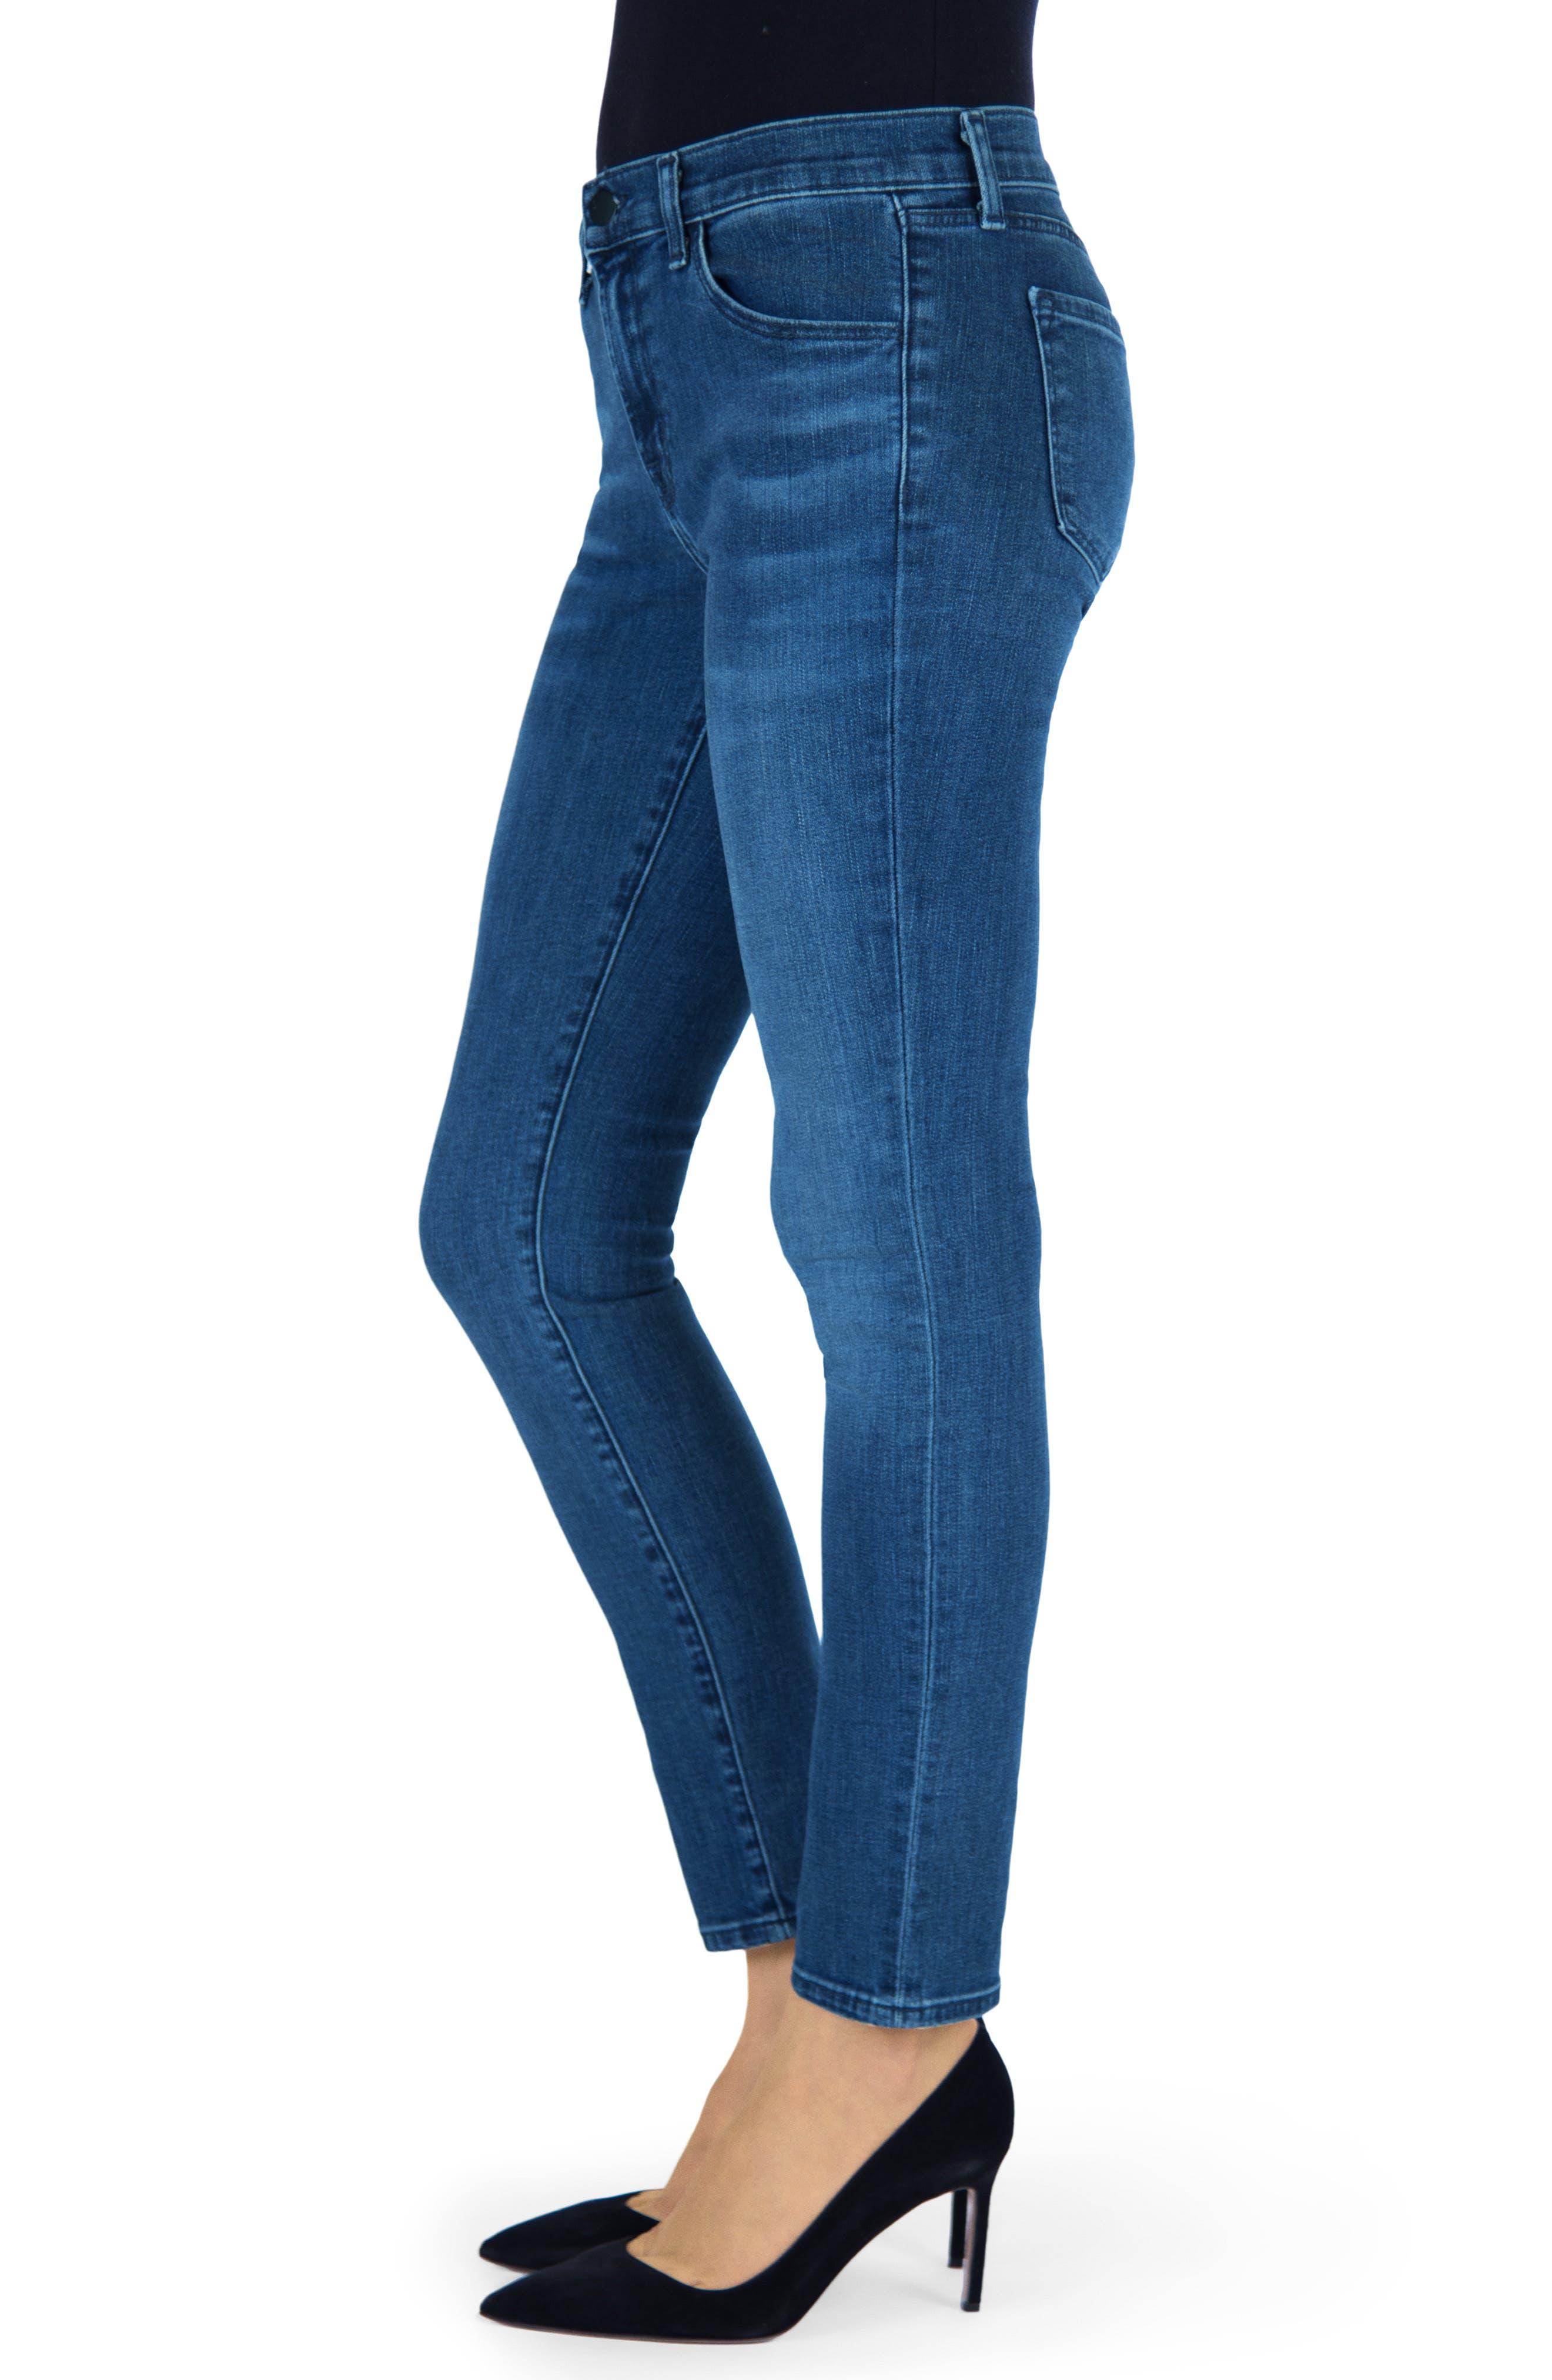 811 Skinny Jeans,                             Alternate thumbnail 3, color,                             400